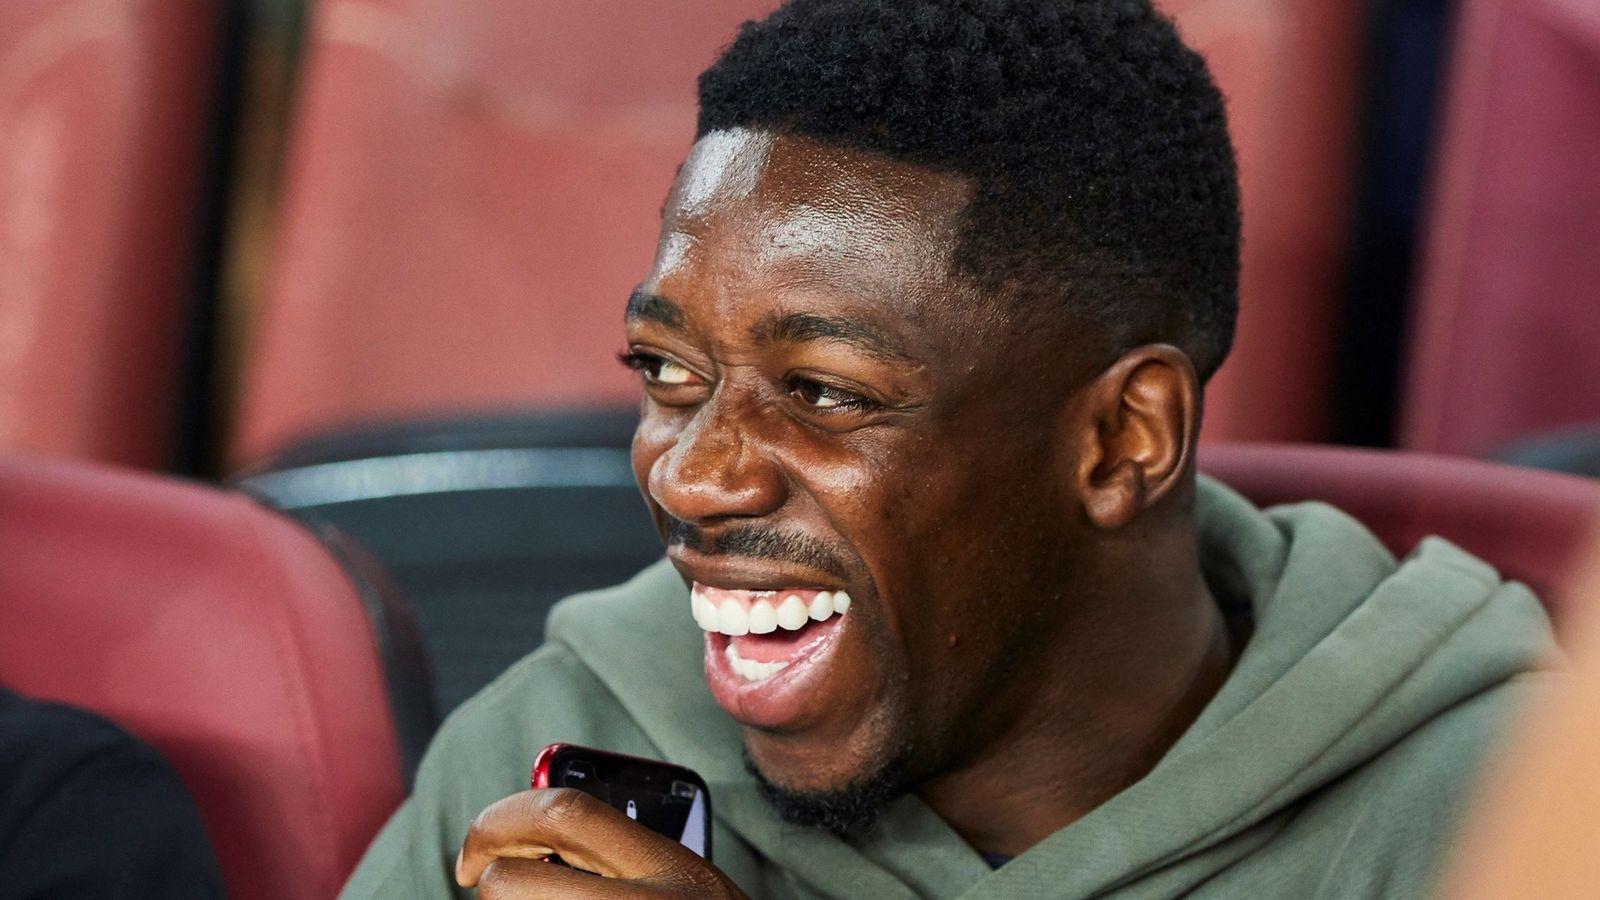 Foto: Ousmane Dembélé, sonriente, en la grada del Camp Nou. (EFE)